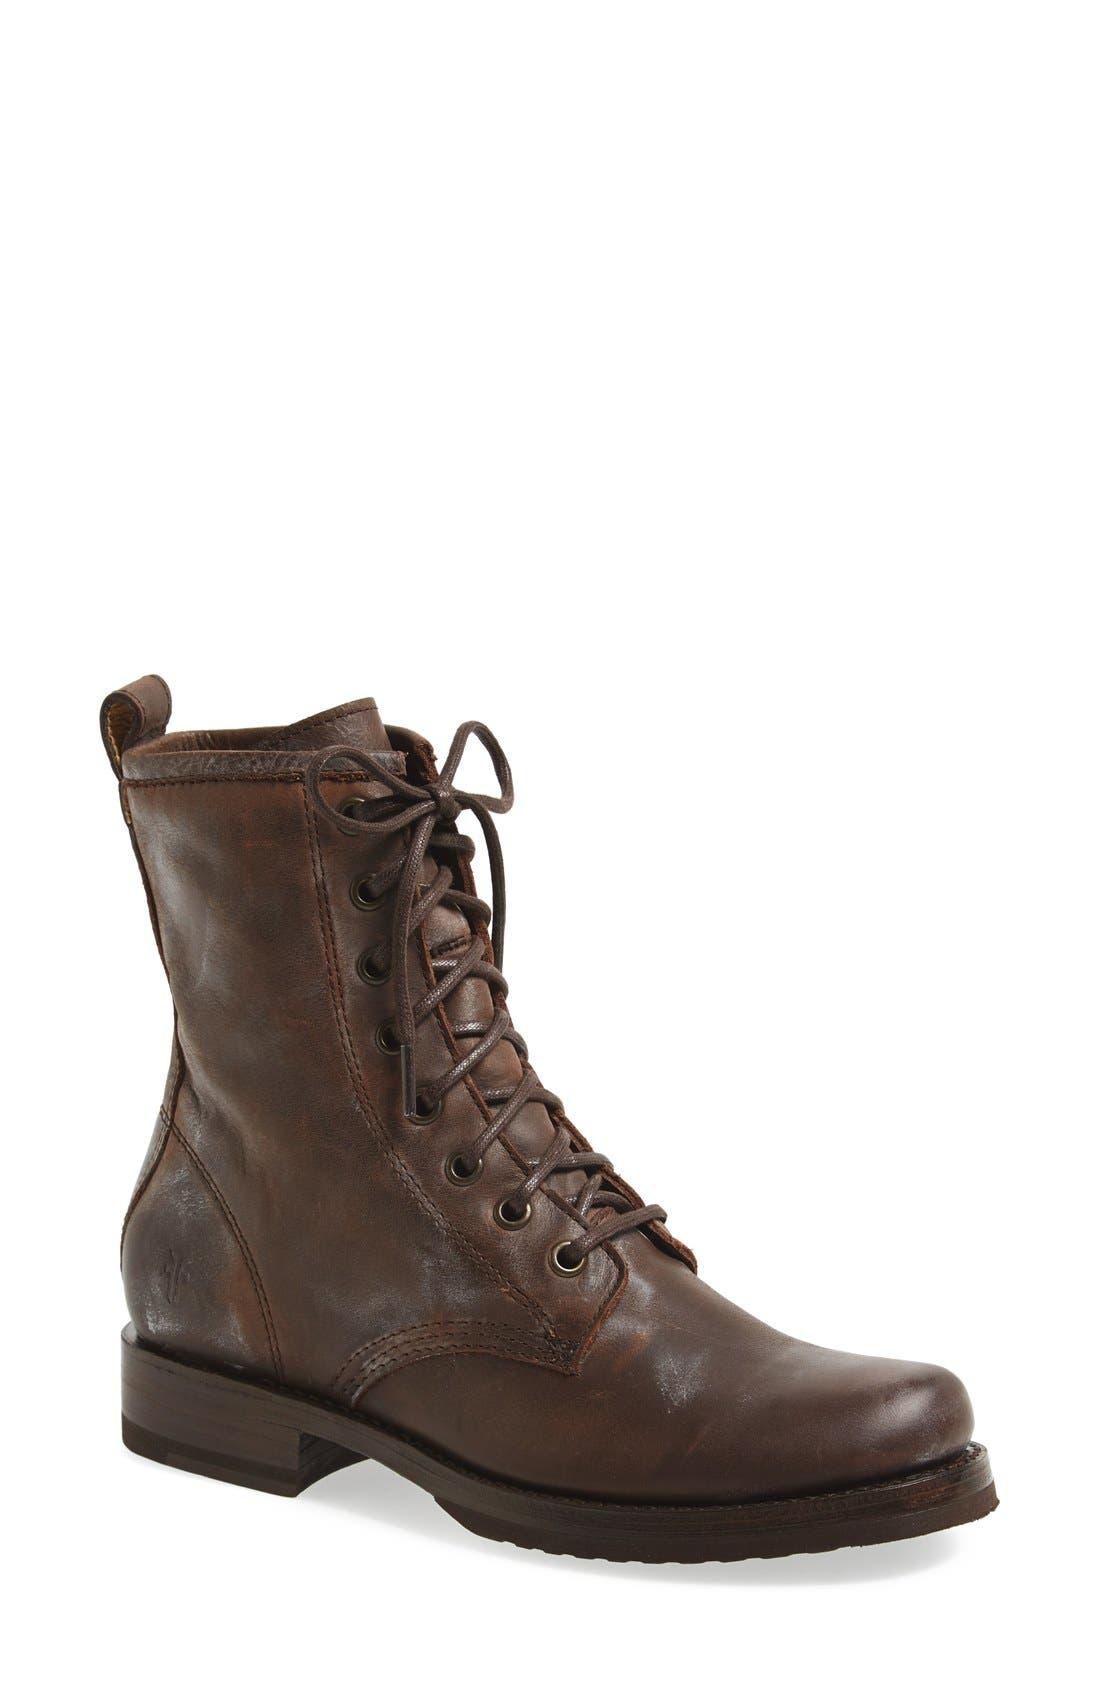 Main Image - Frye 'Veronica Combat' Boot (Women)